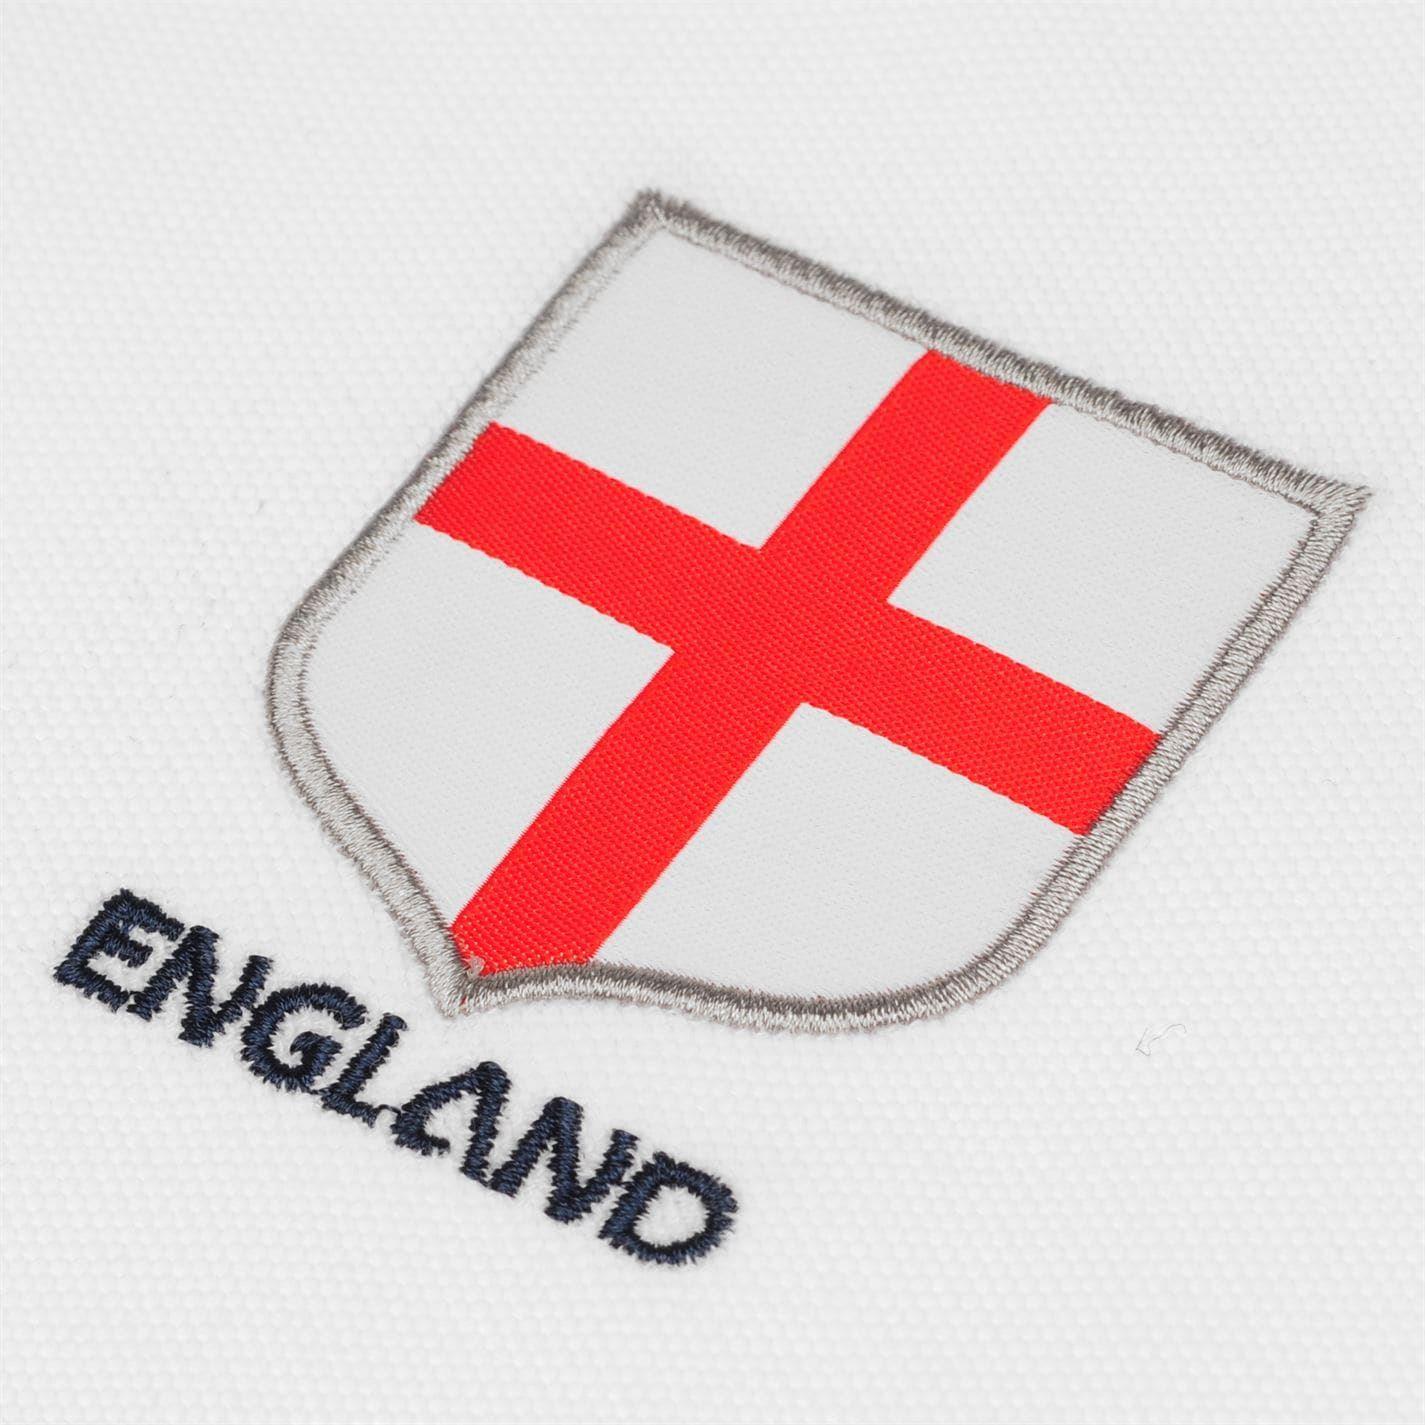 miniature 10 - FIFA Coupe du monde 2018 Angleterre Polo Shirt Homme Football Soccer Top T-Shirt Tee